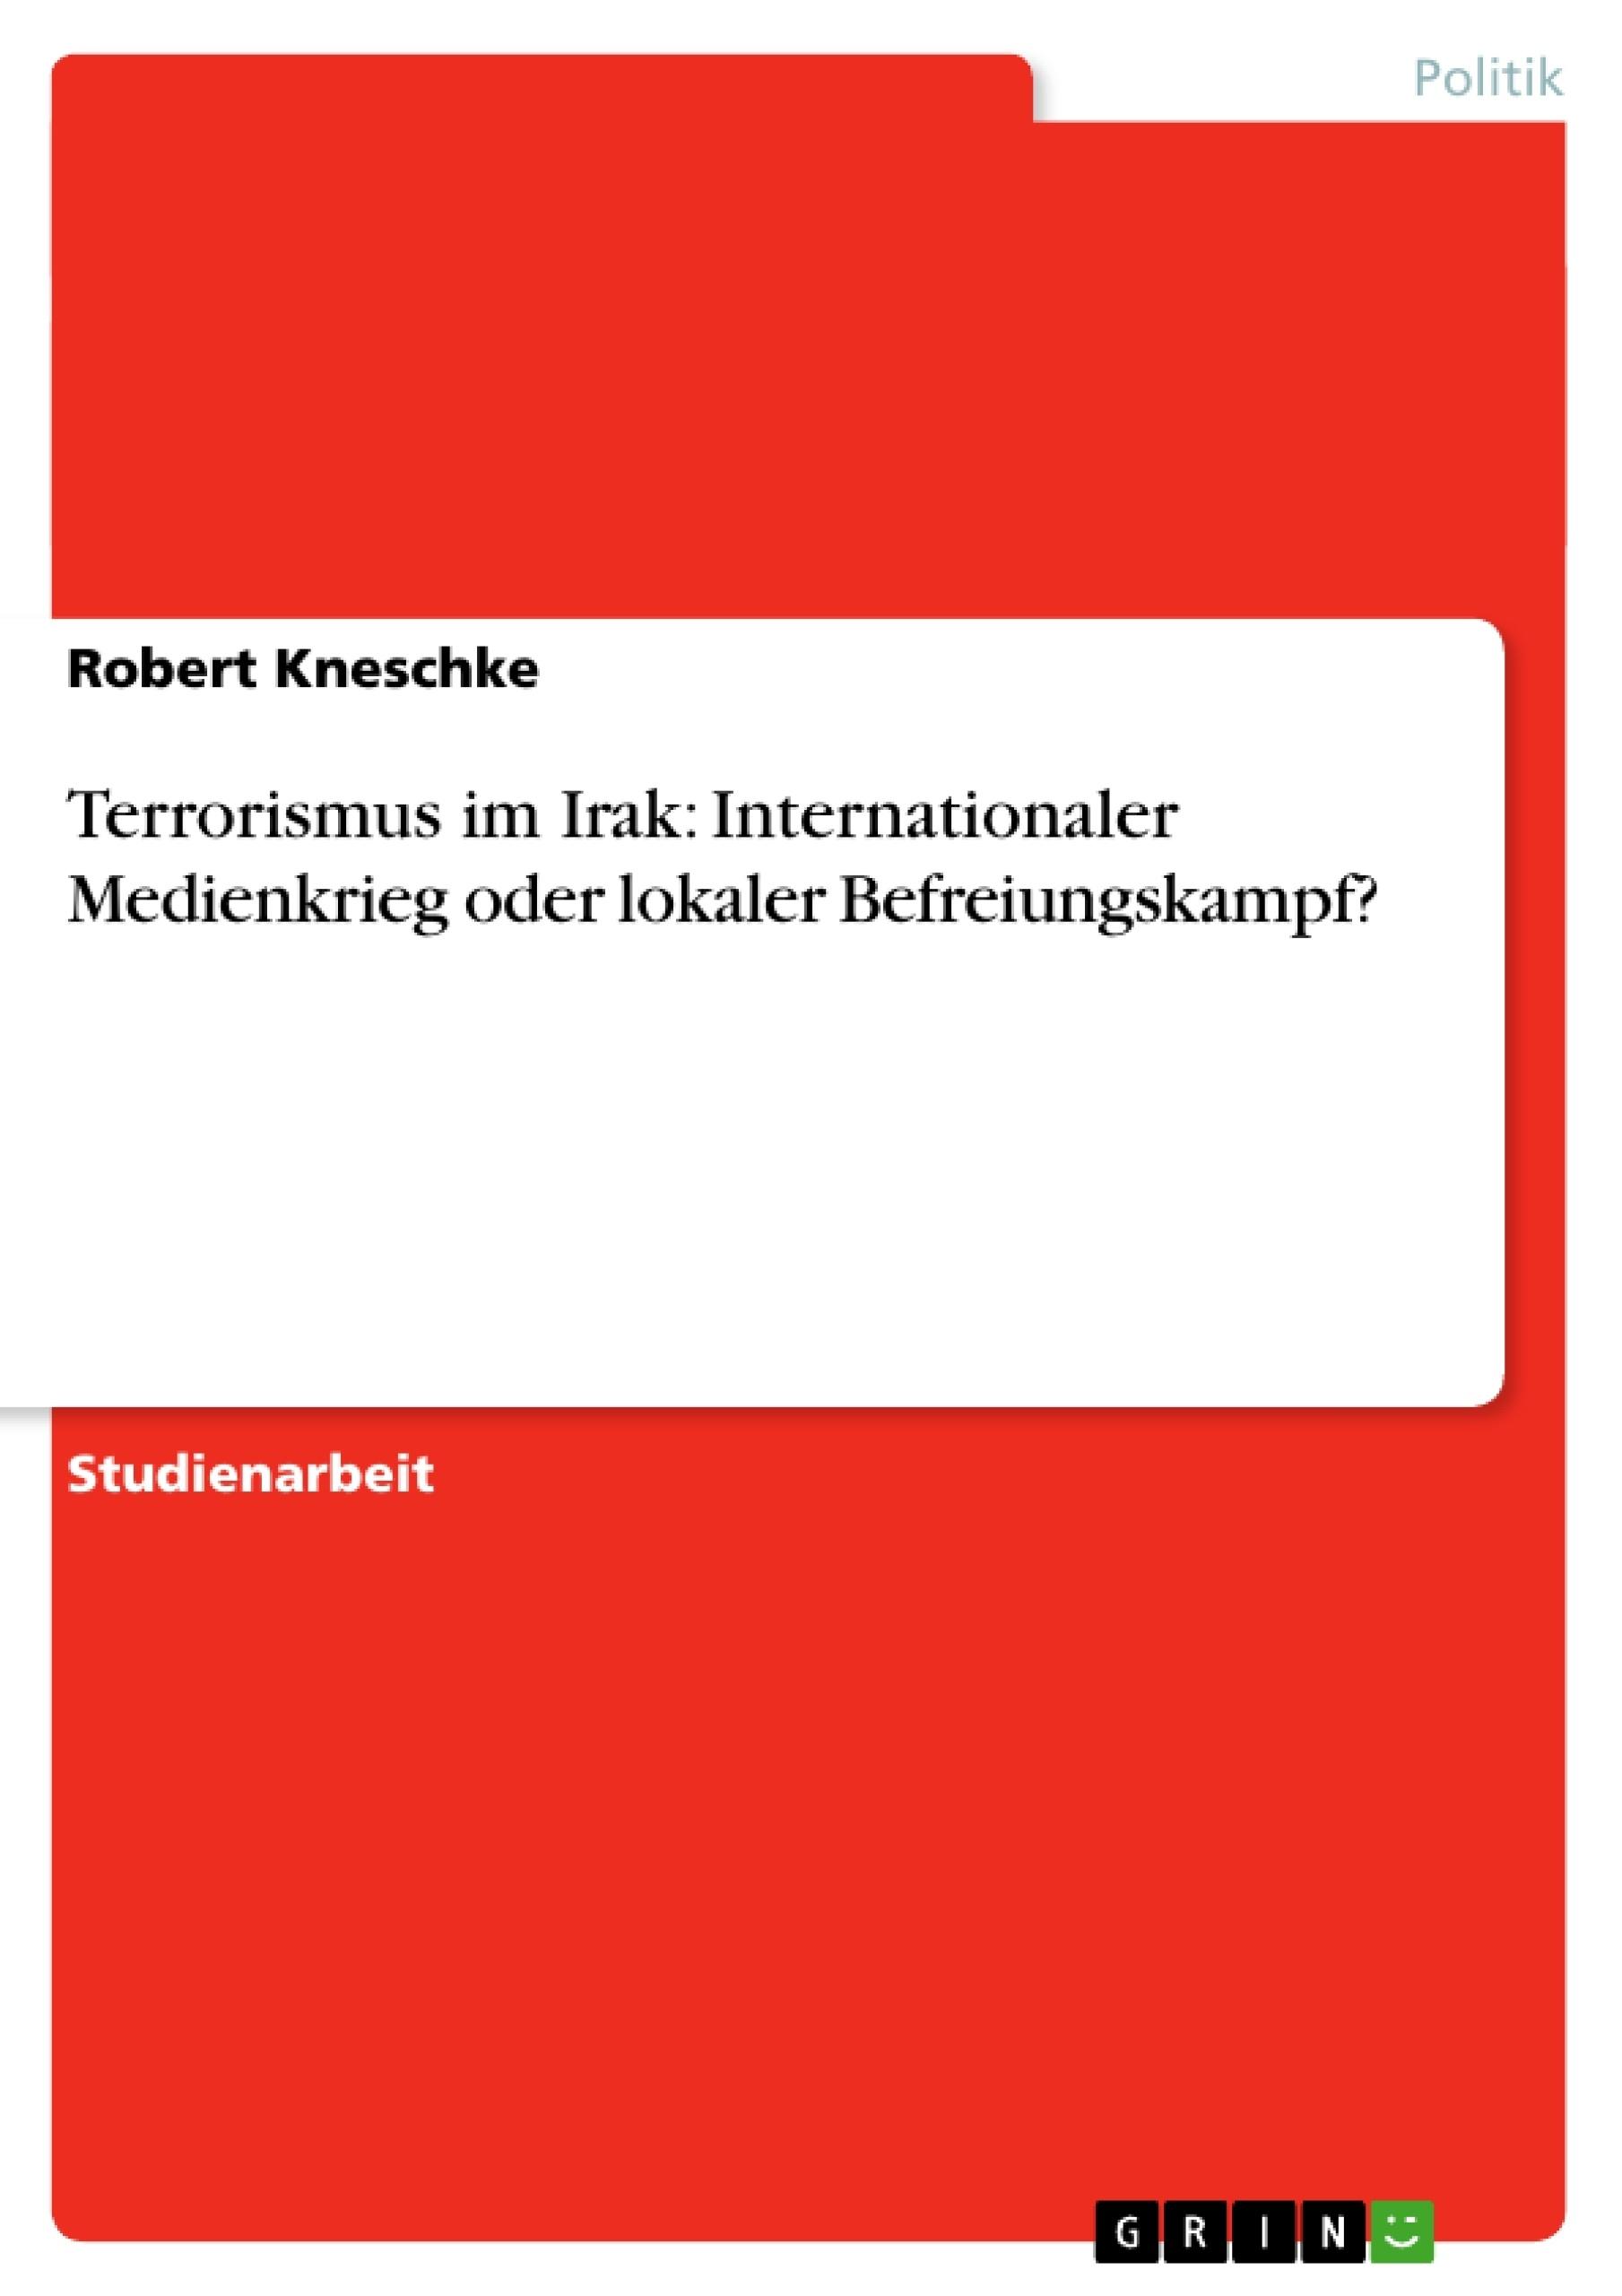 Titel: Terrorismus im Irak: Internationaler Medienkrieg oder lokaler Befreiungskampf?